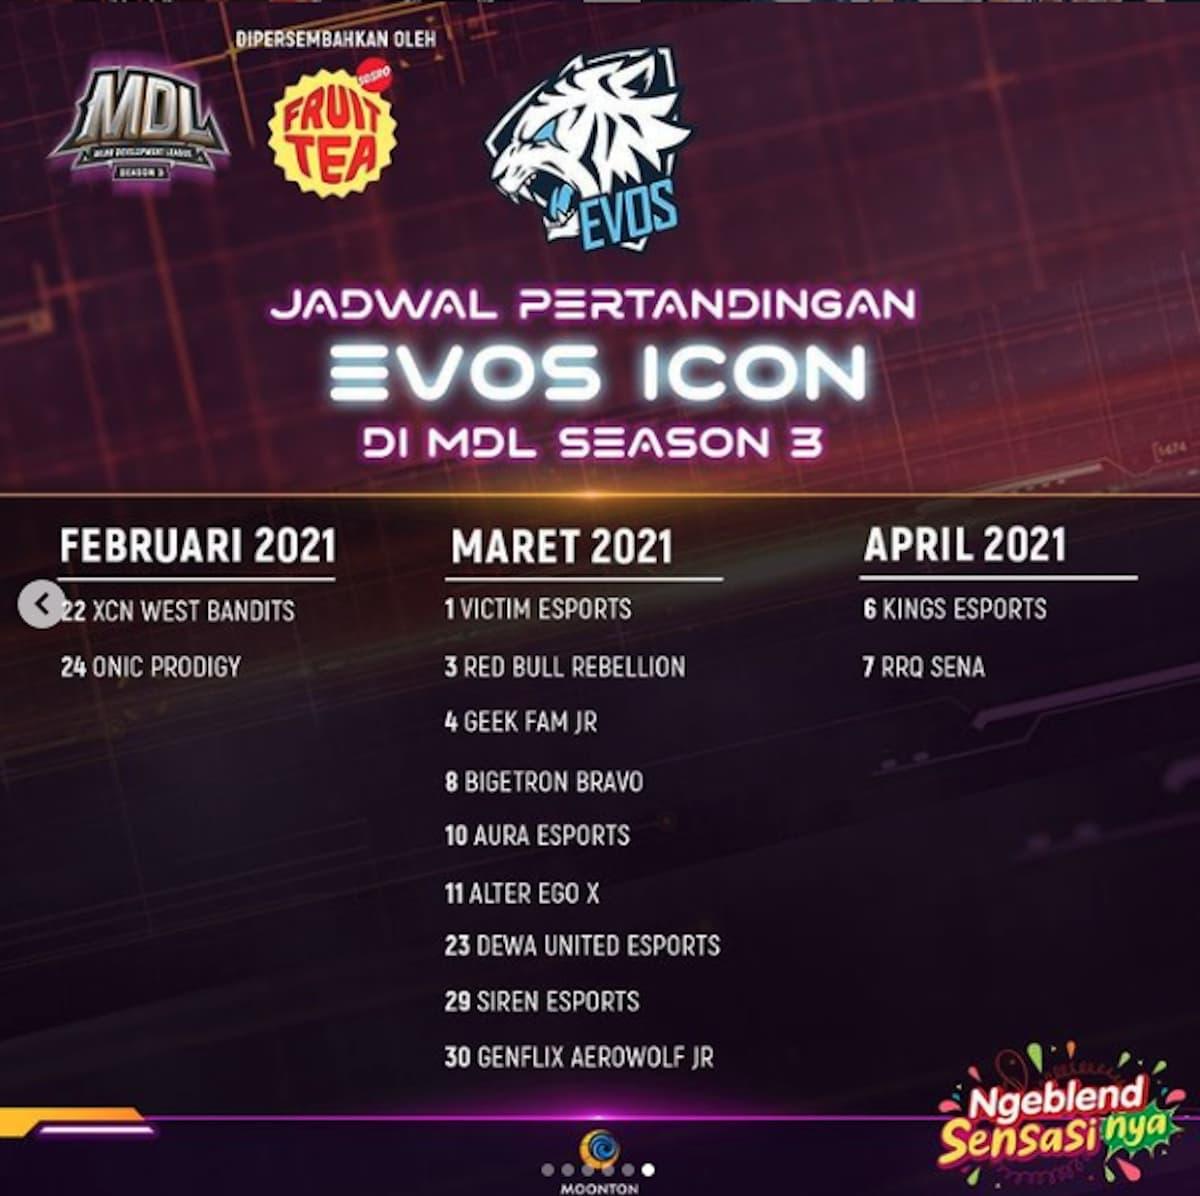 EVOS Icon MDL ID Season 3 Mobile Legends (ML) Schedule